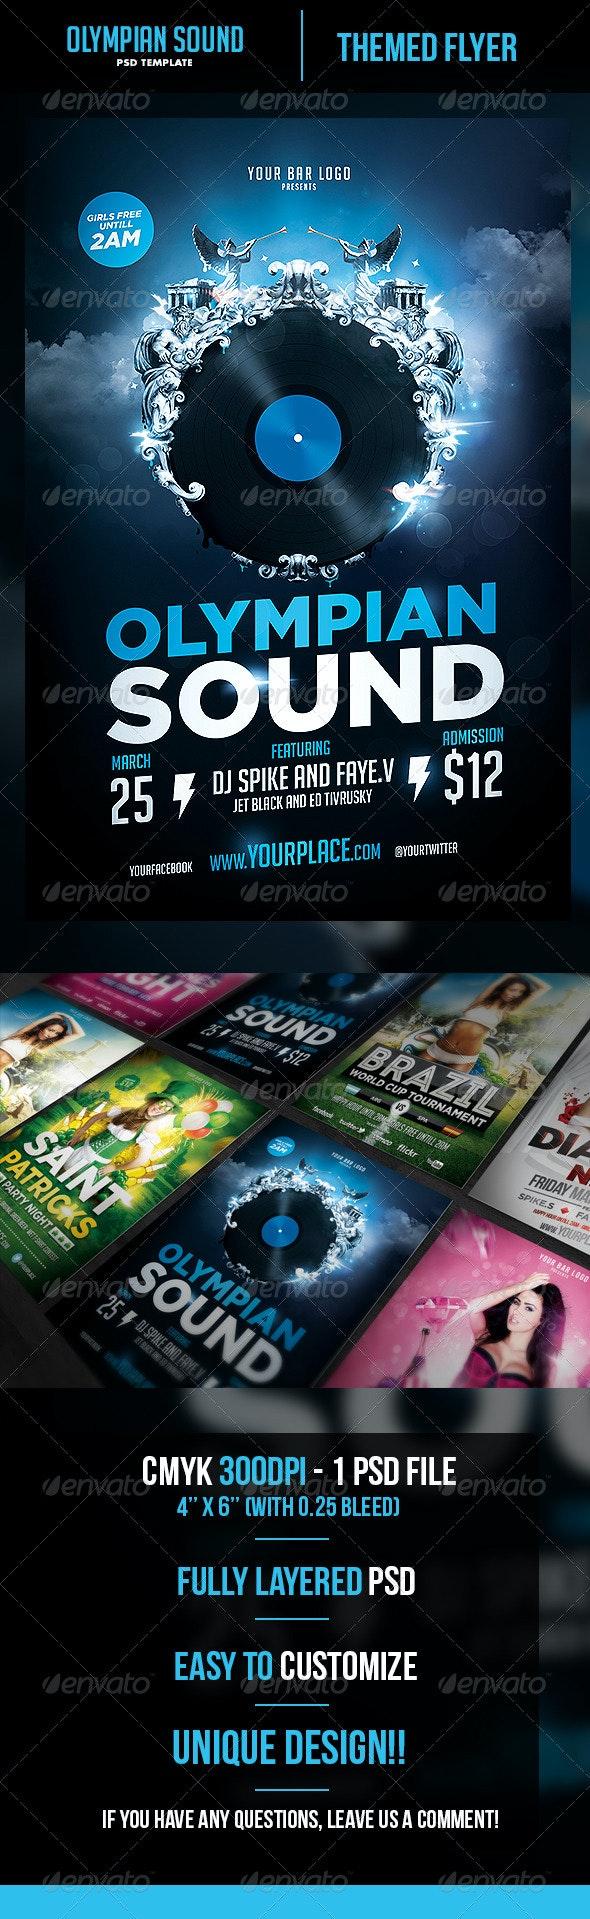 Olympian Sound Flyer Template - Flyers Print Templates